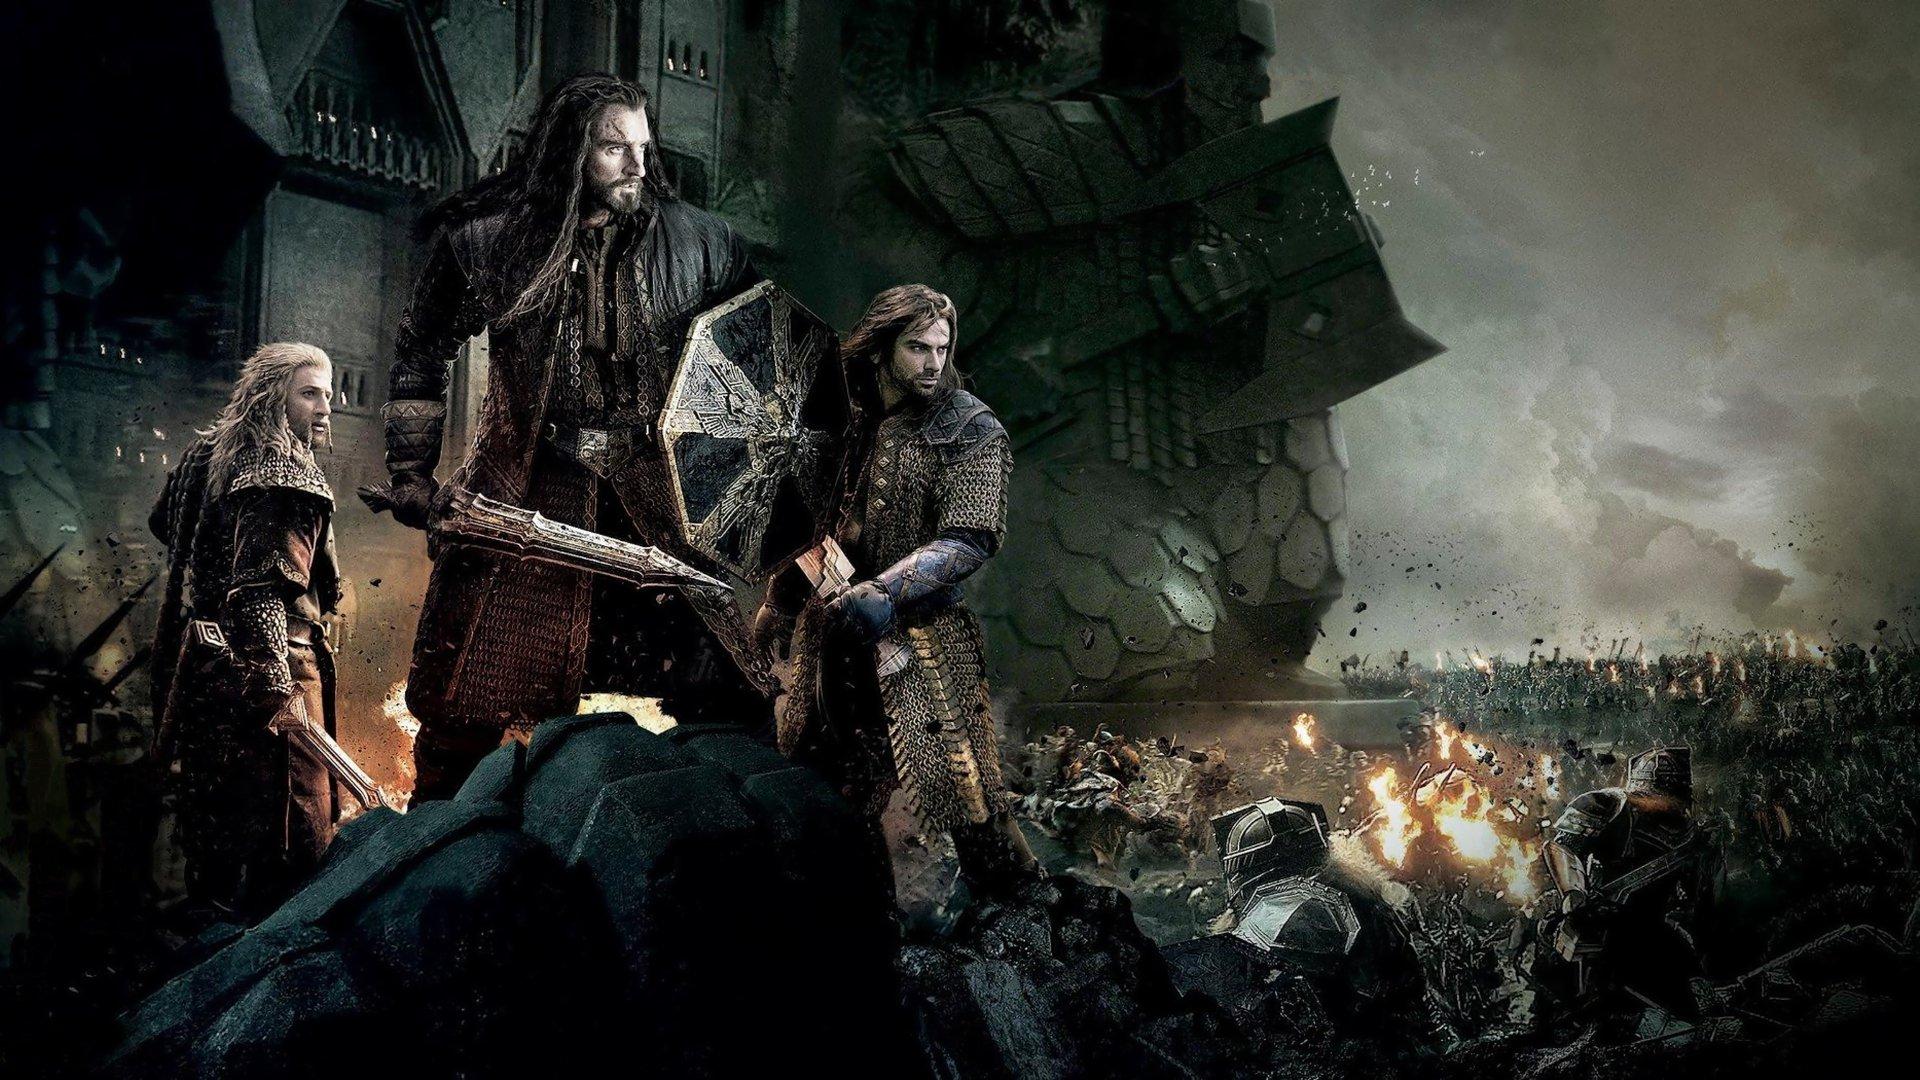 The Hobbit Battle Of Five Armies Full HD Wallpaper